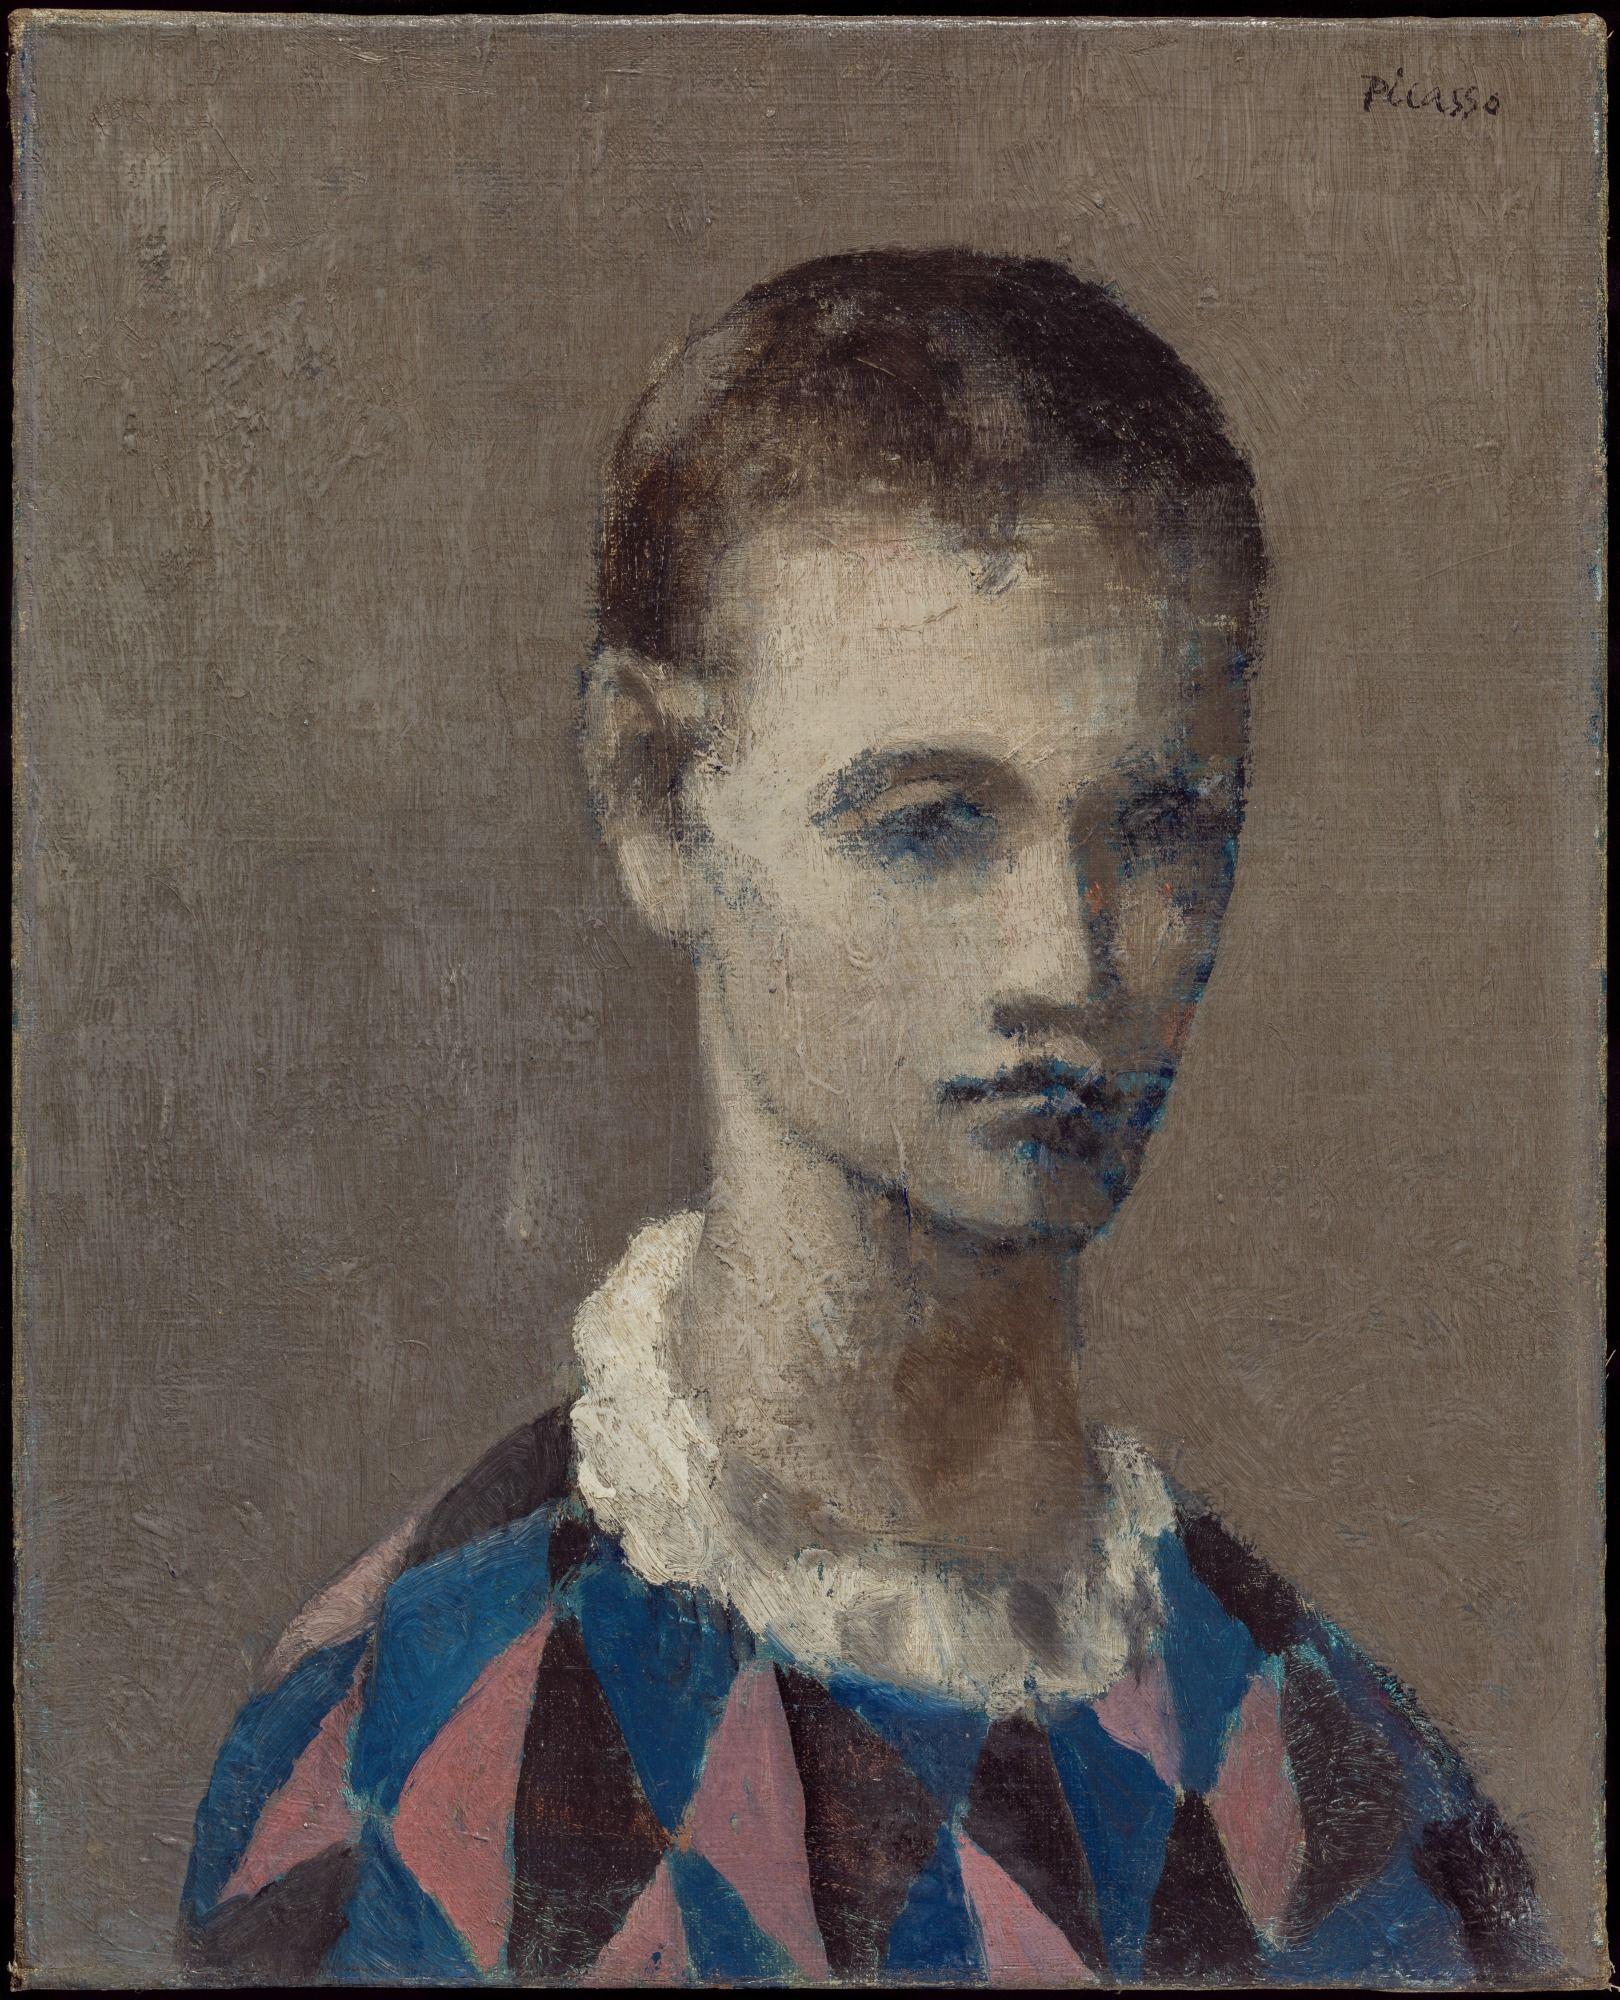 Deteoit Institute Of Arts 2womem Painting